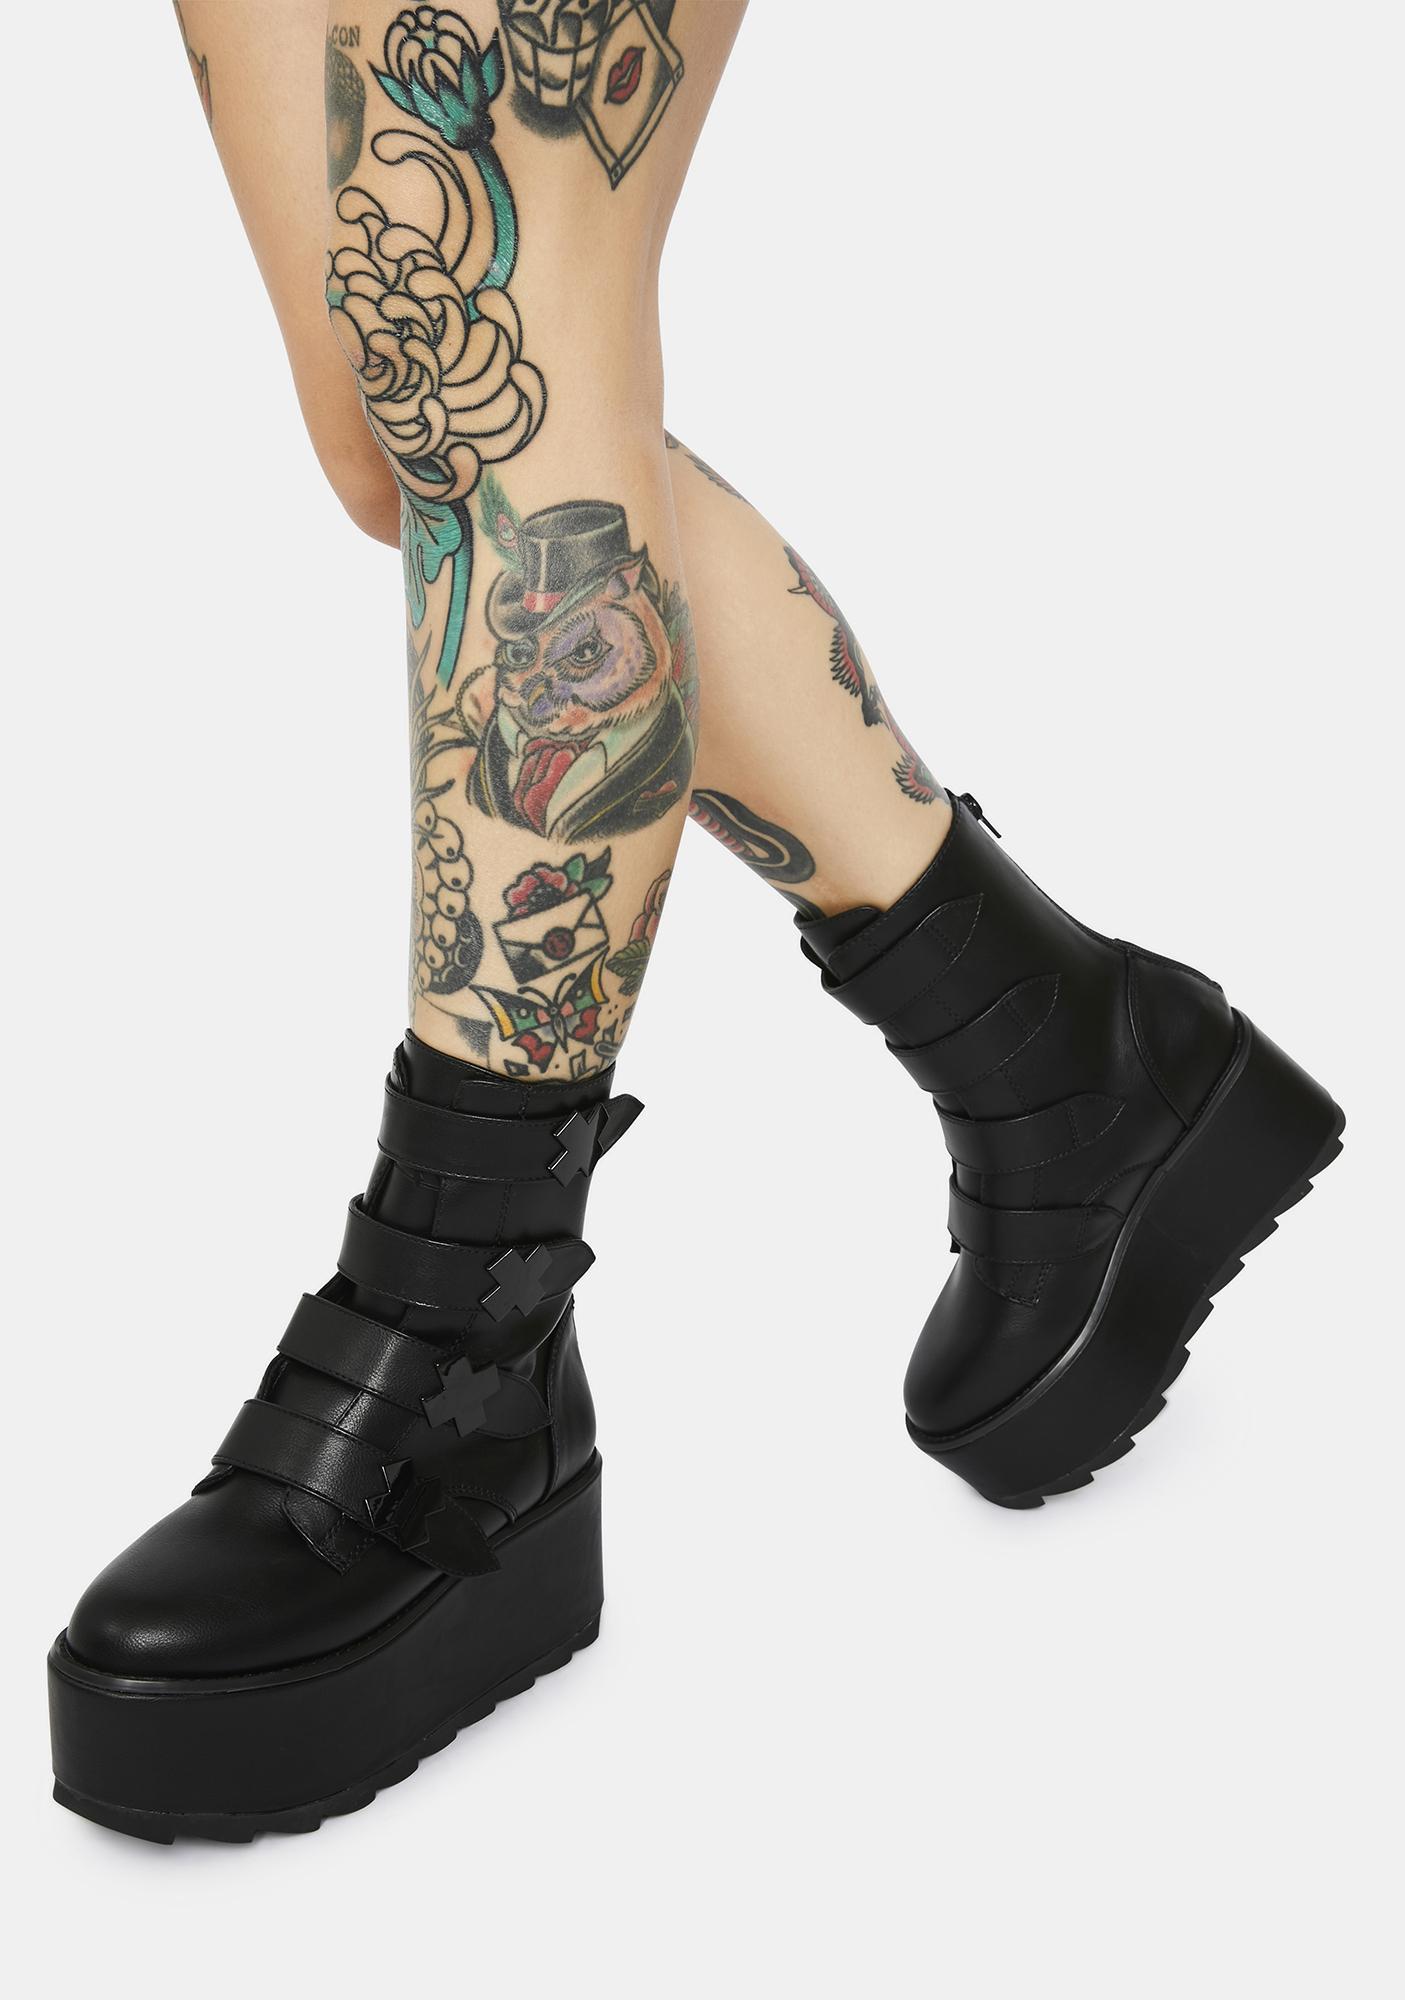 Y.R.U. Karma X Blackout Platform Boots